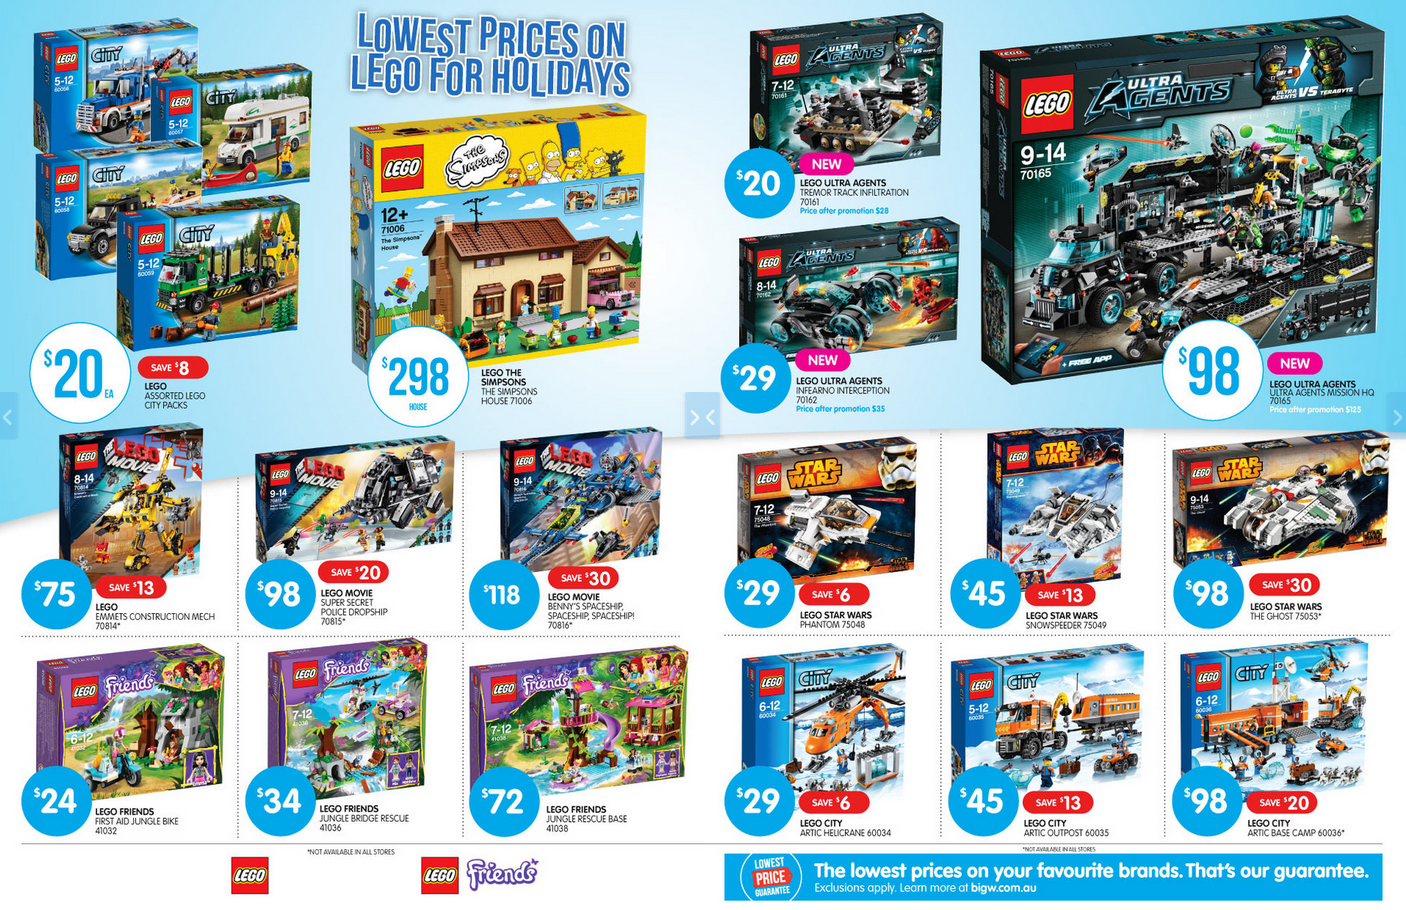 Big W LEGO Sale September 2014 W Catalogue